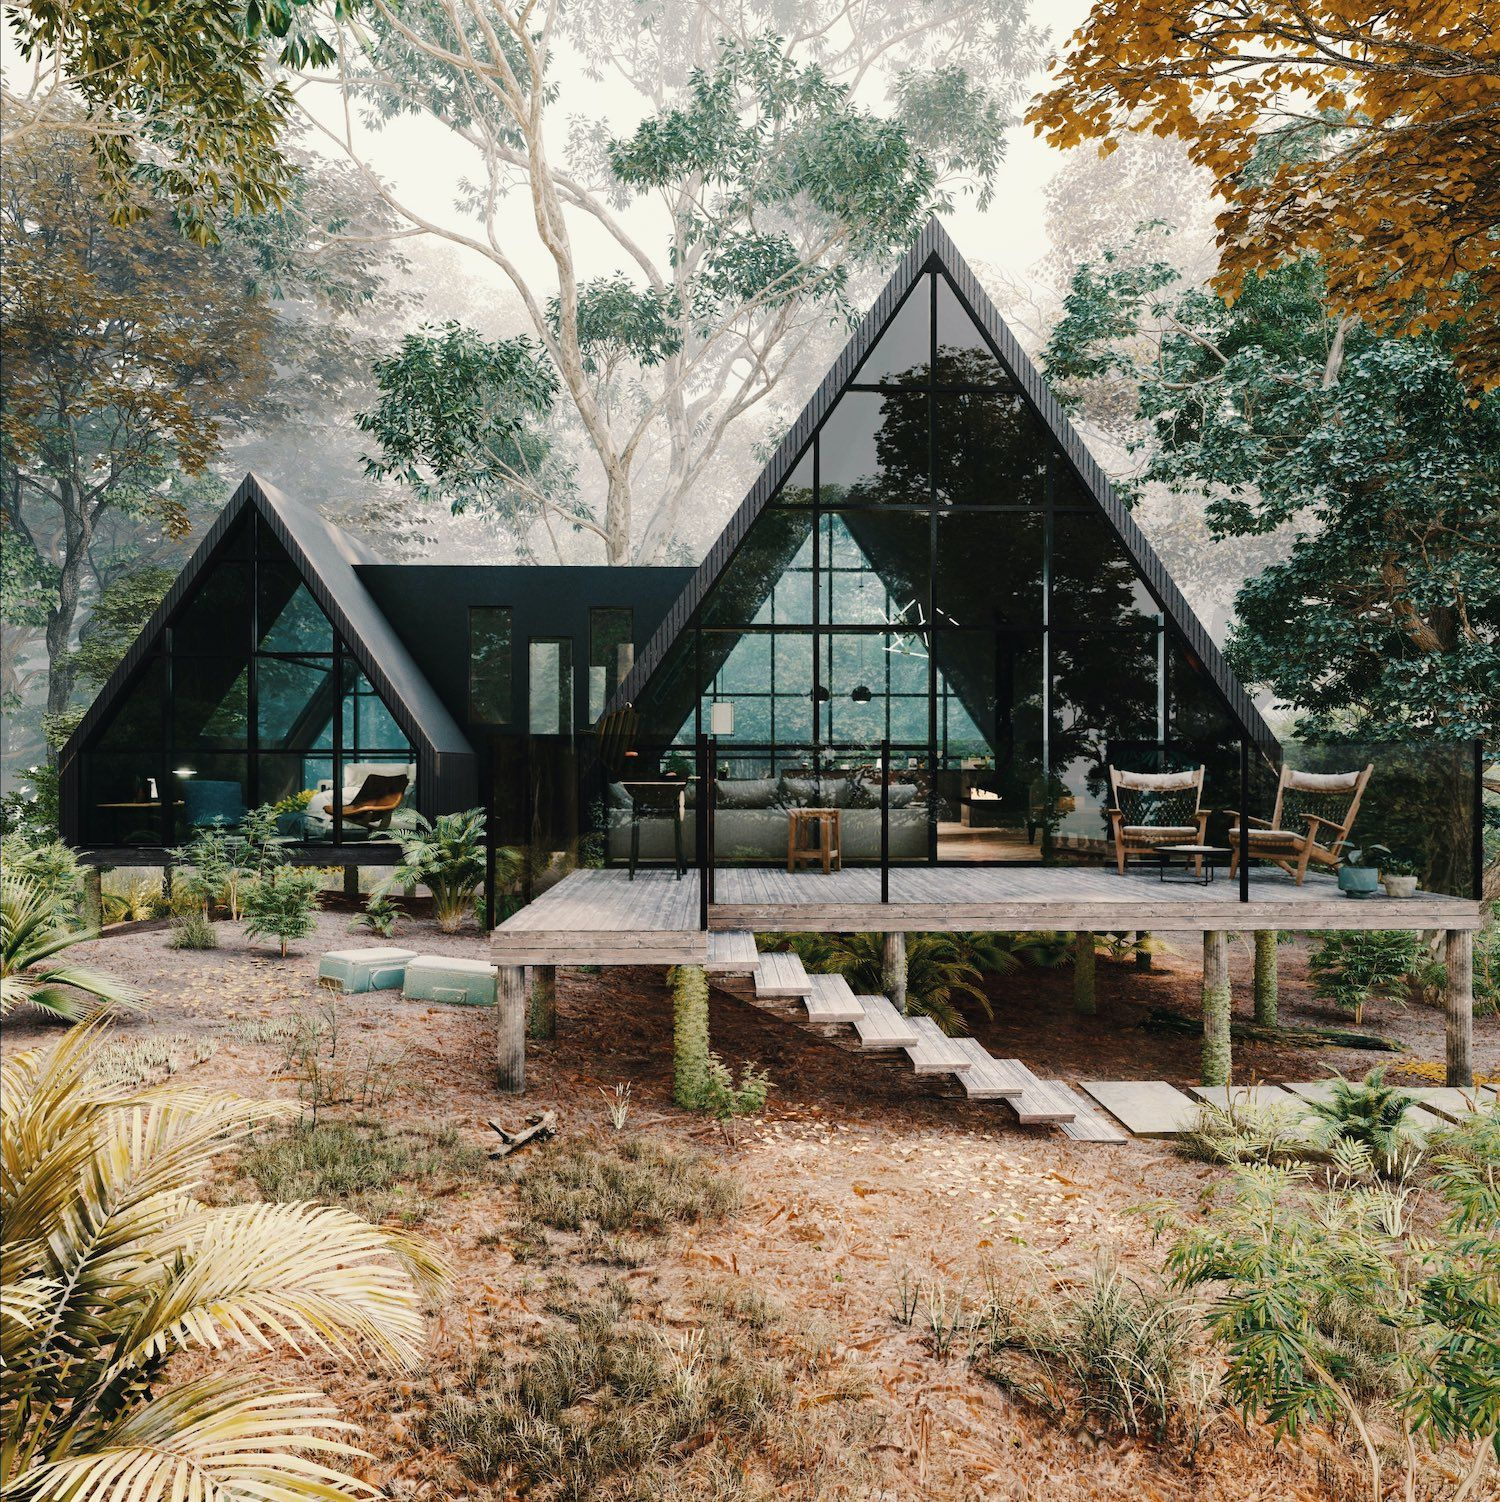 Une Immense Cabane Vitree A L Interieur Contemporain Planete Deco A Homes World In 2021 A Frame House Plans House Exterior Cabin Design